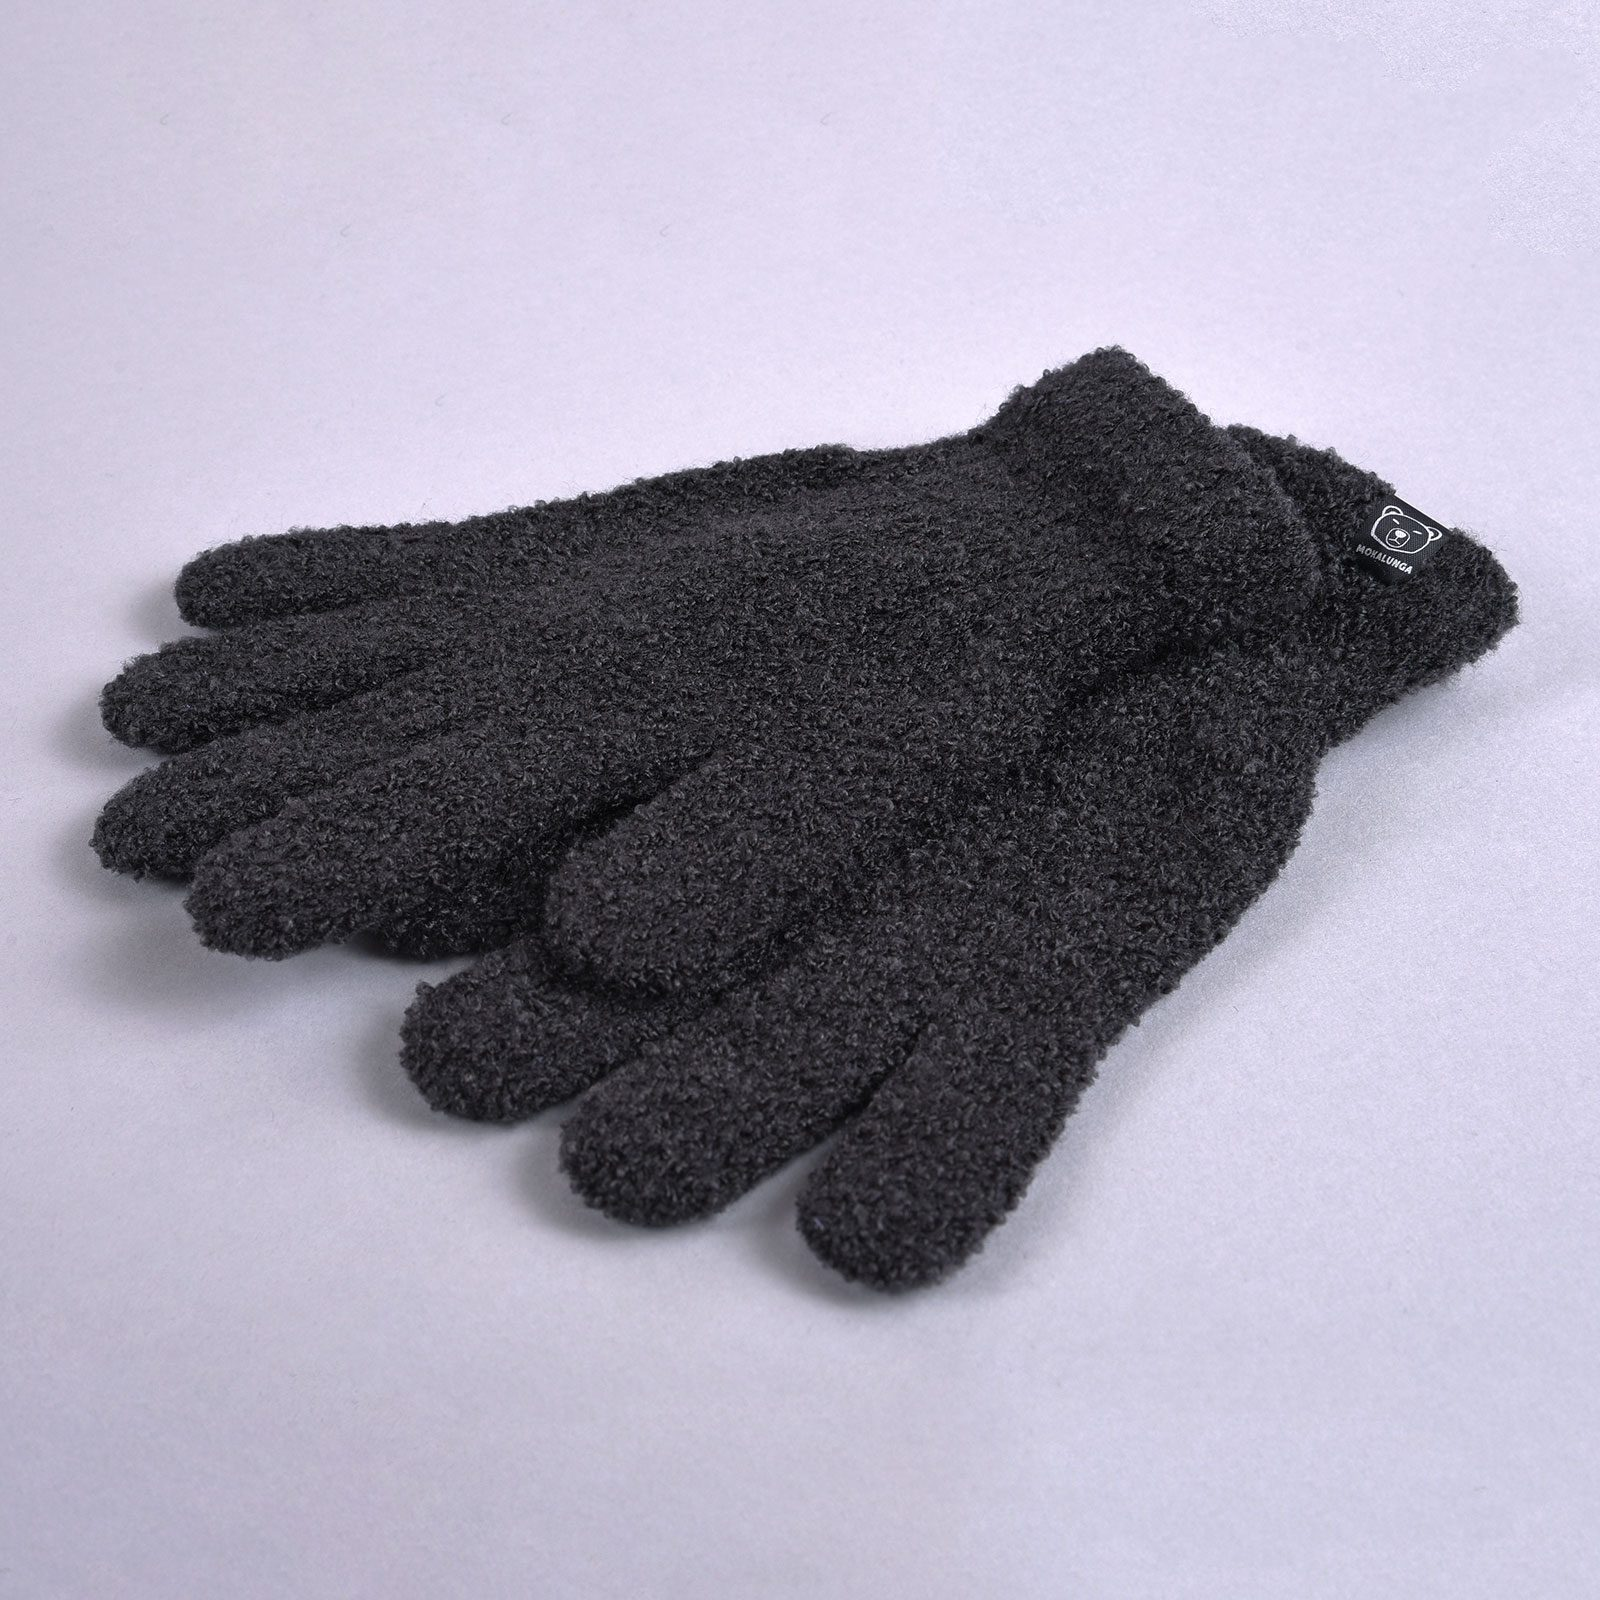 http://lookbook.allee-du-foulard.fr/wp-content/uploads/2018/12/GA-00015-F16-2-paire-gants-femme-gris-anthracite-1600x1600.jpg